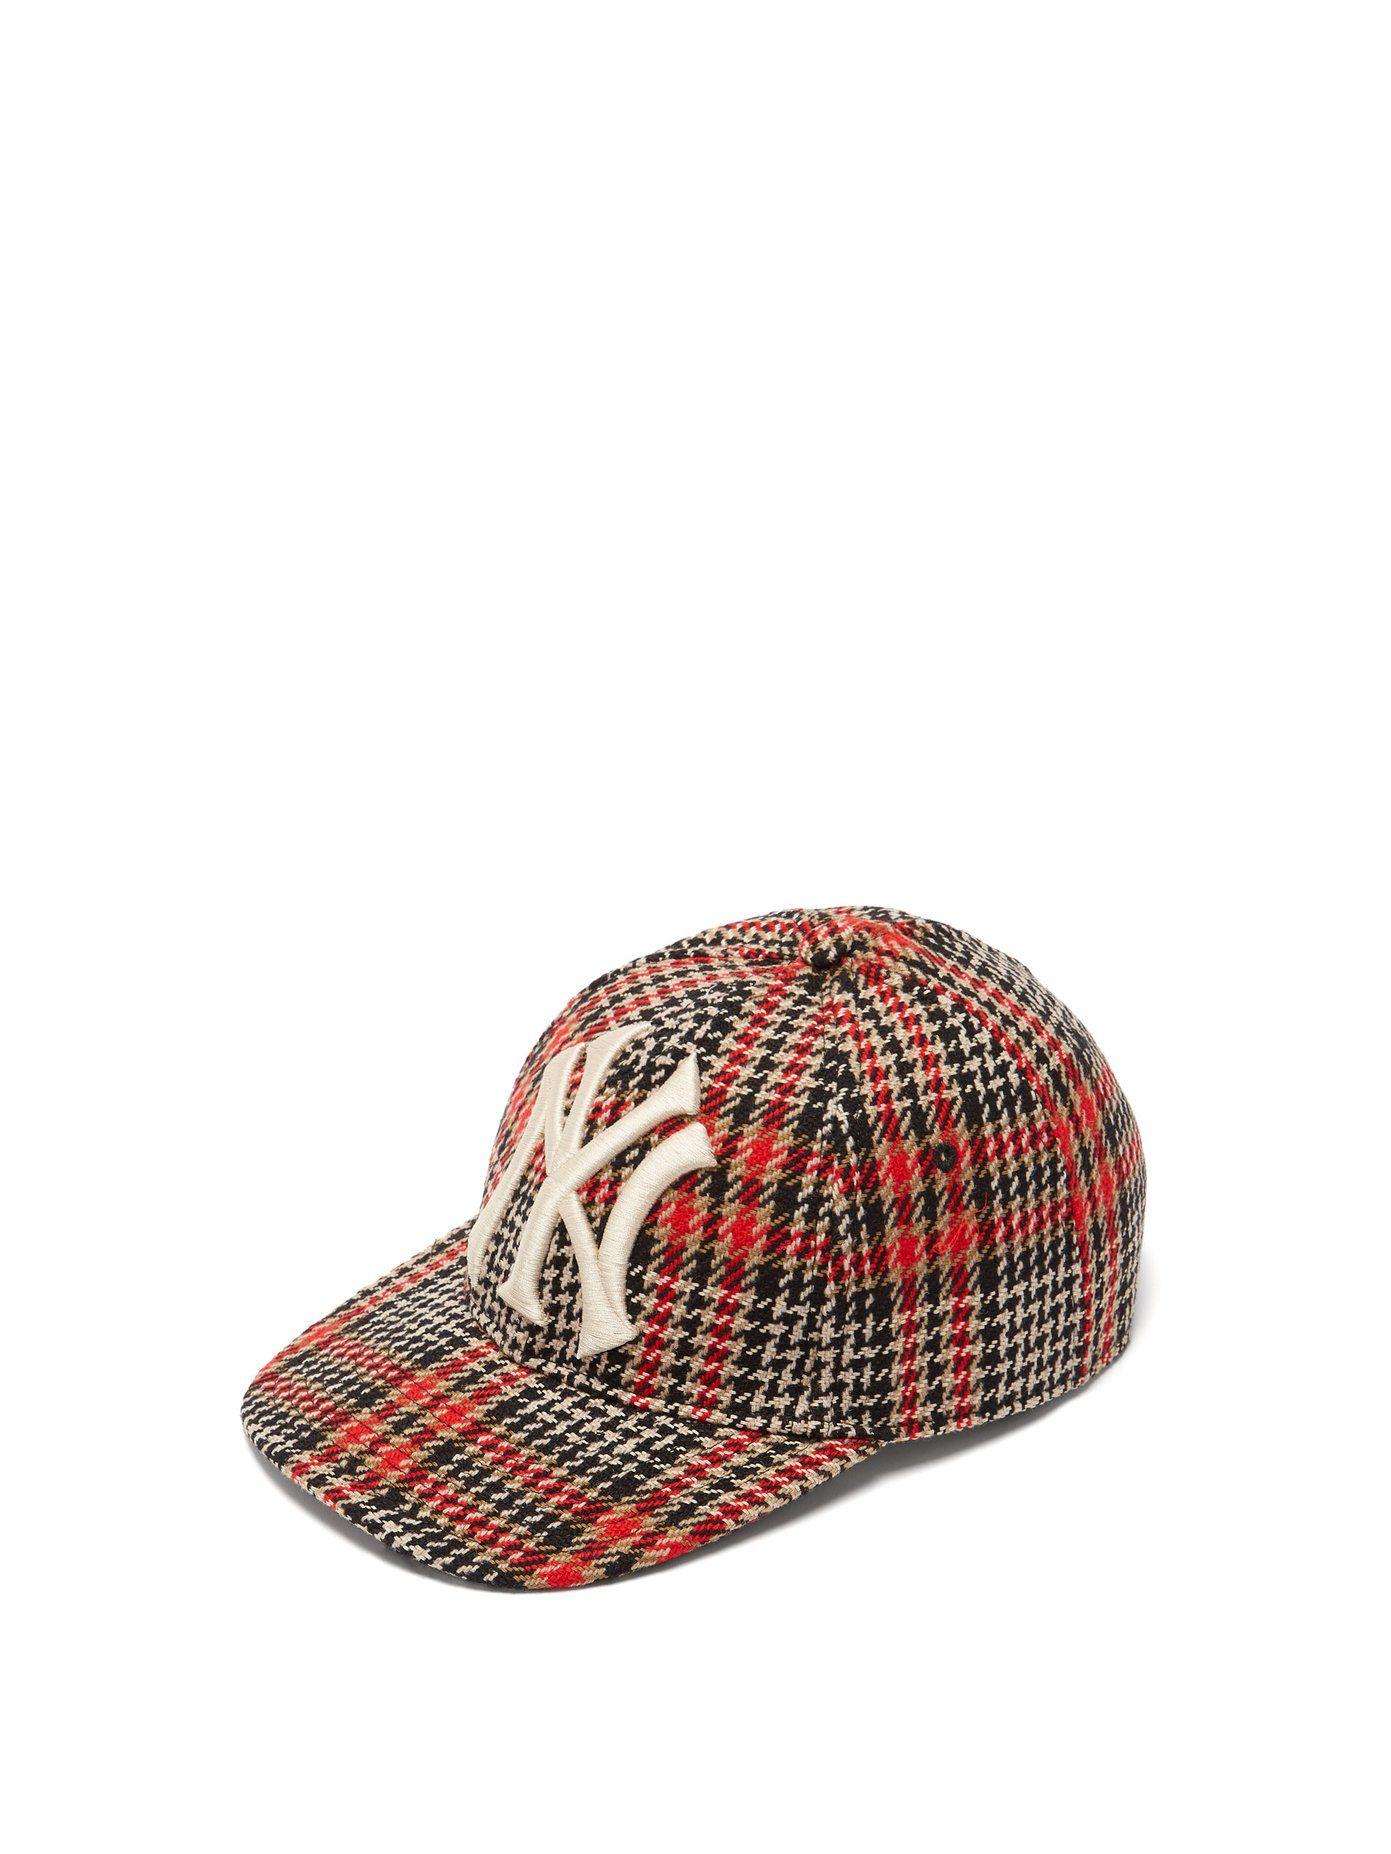 dccfccc65c694d NY Yankees wool-blend tweed baseball cap | Gucci | MATCHESFASHION.COM UK